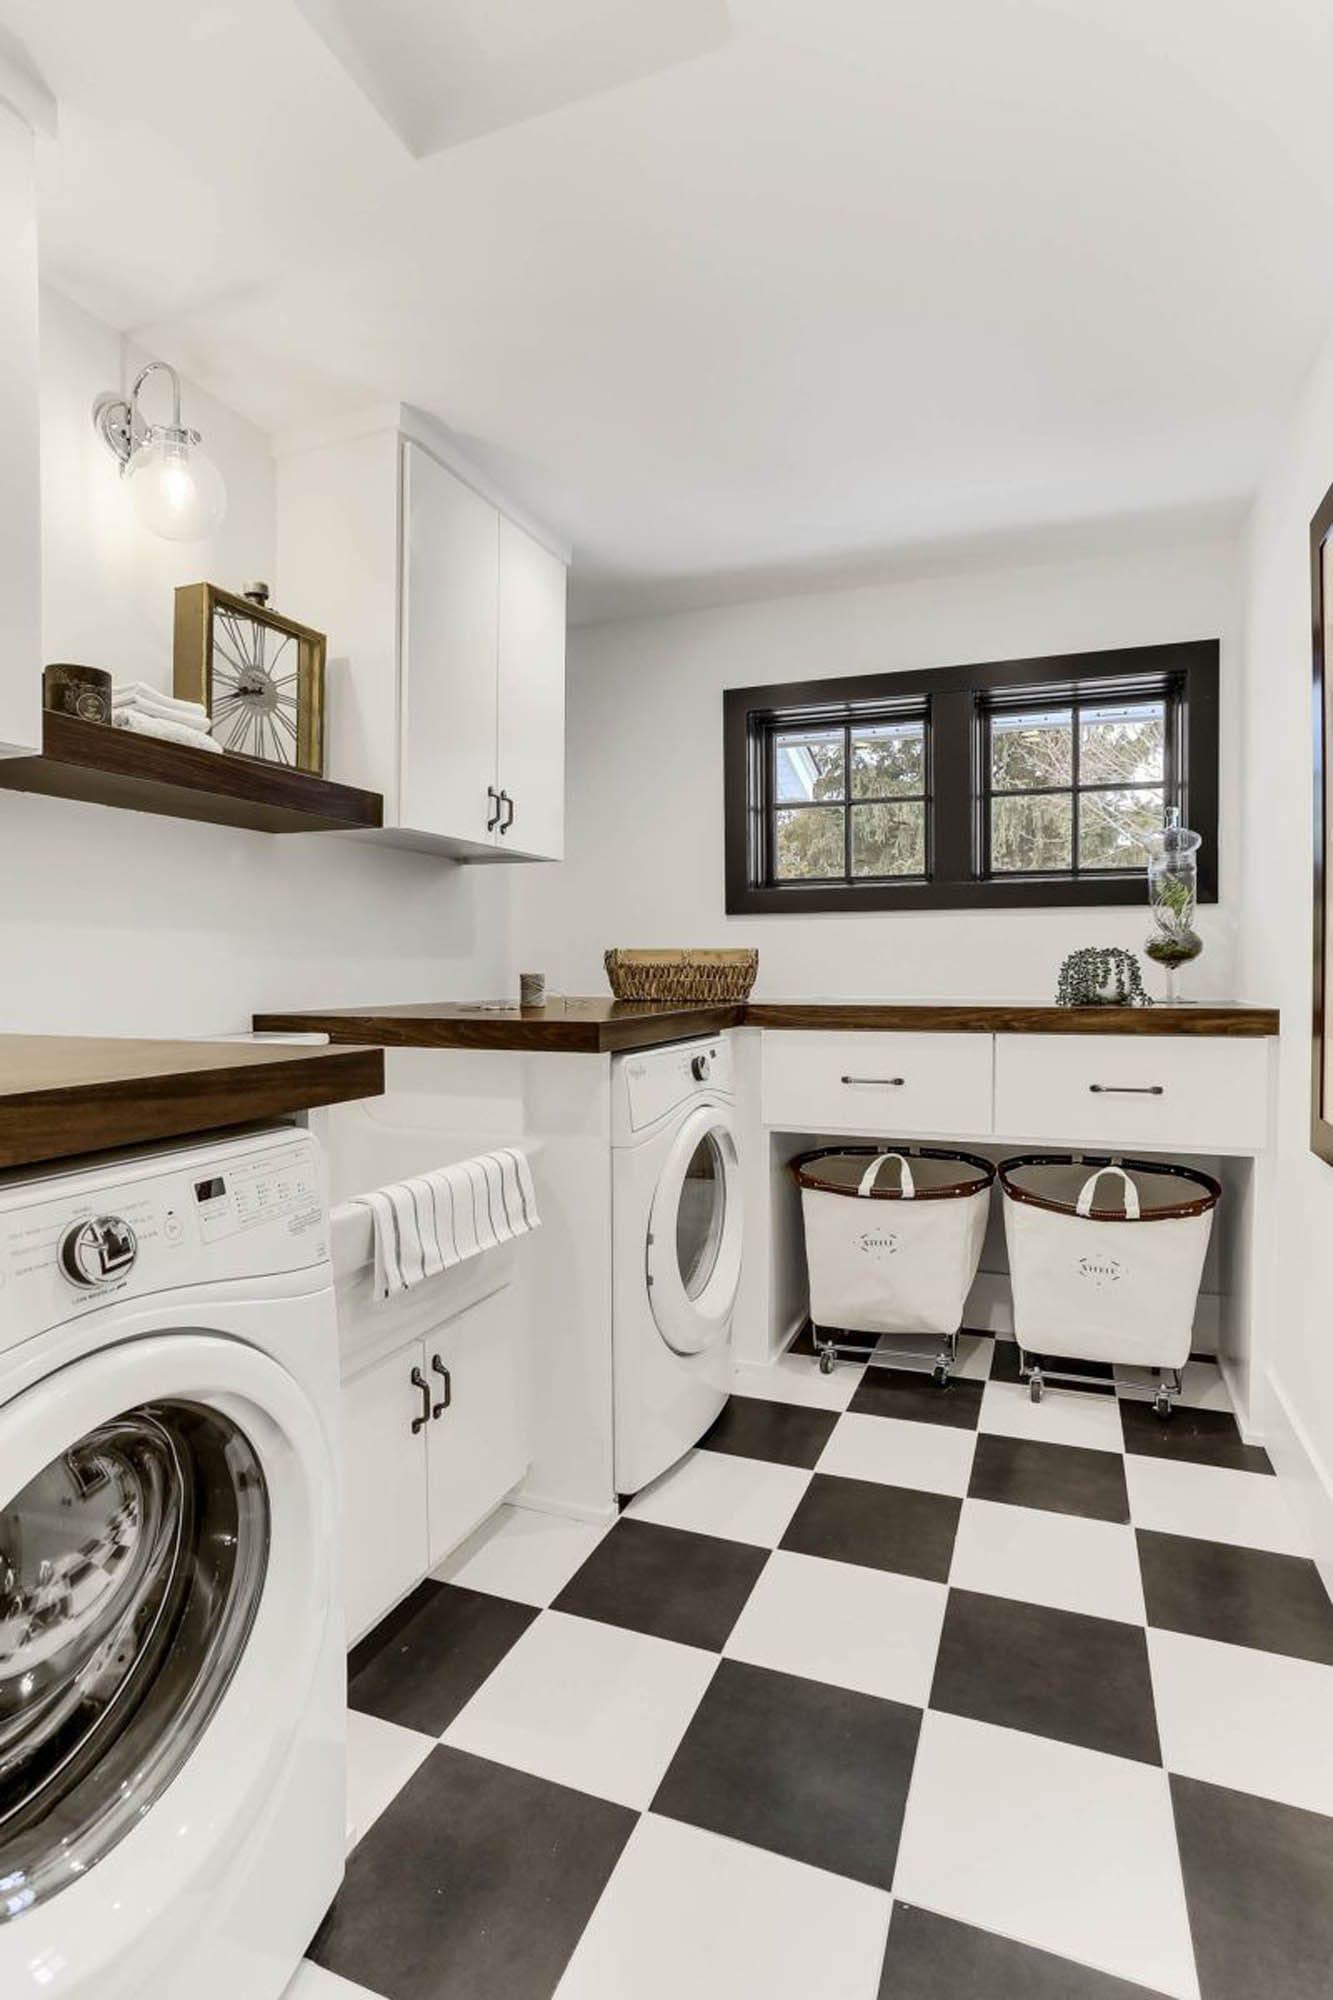 black and white kitchen tiles design images